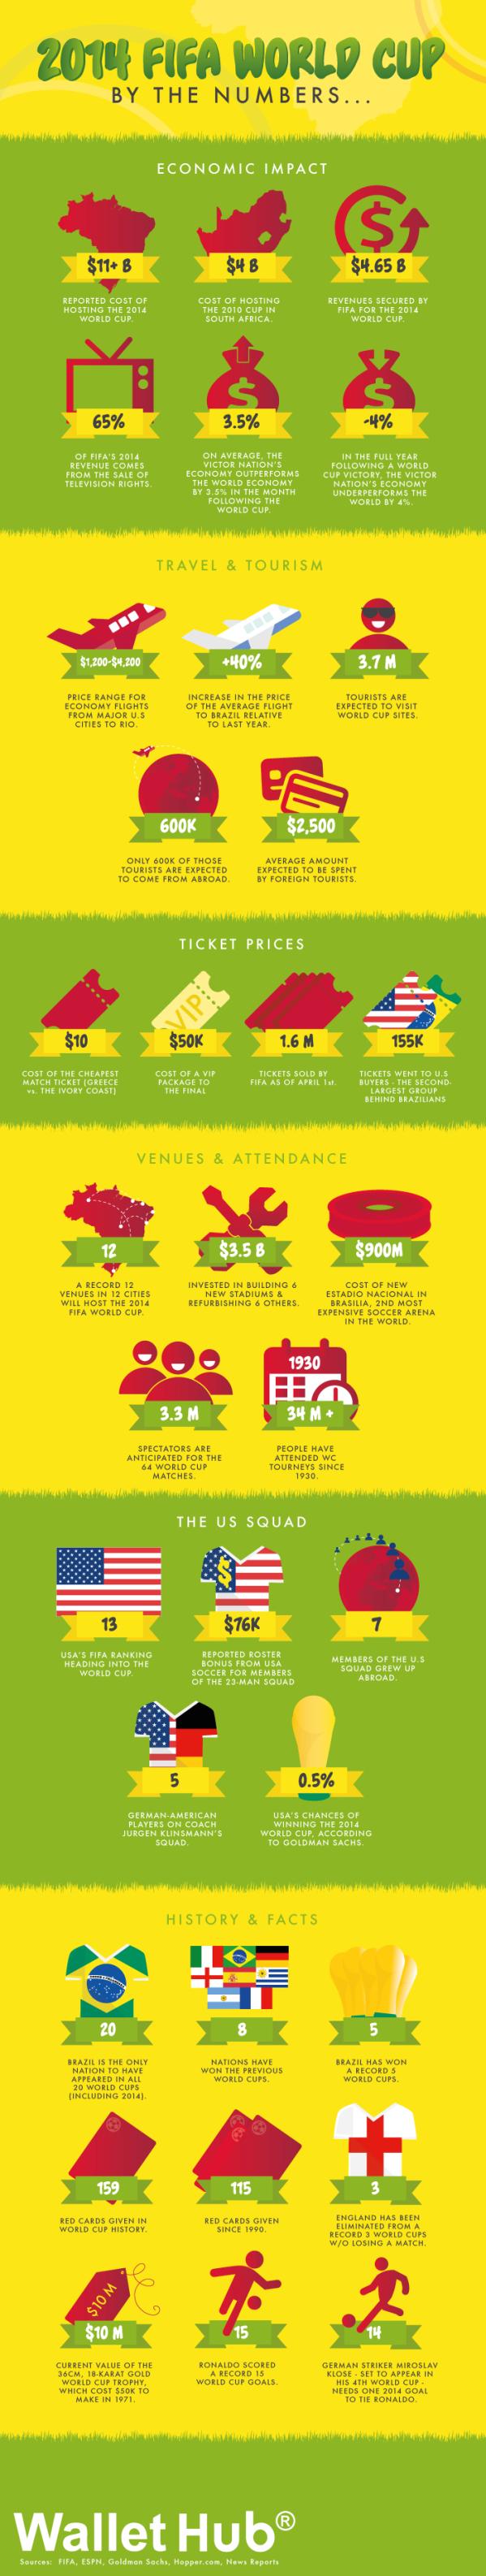 wallethub_infographic_v3-2